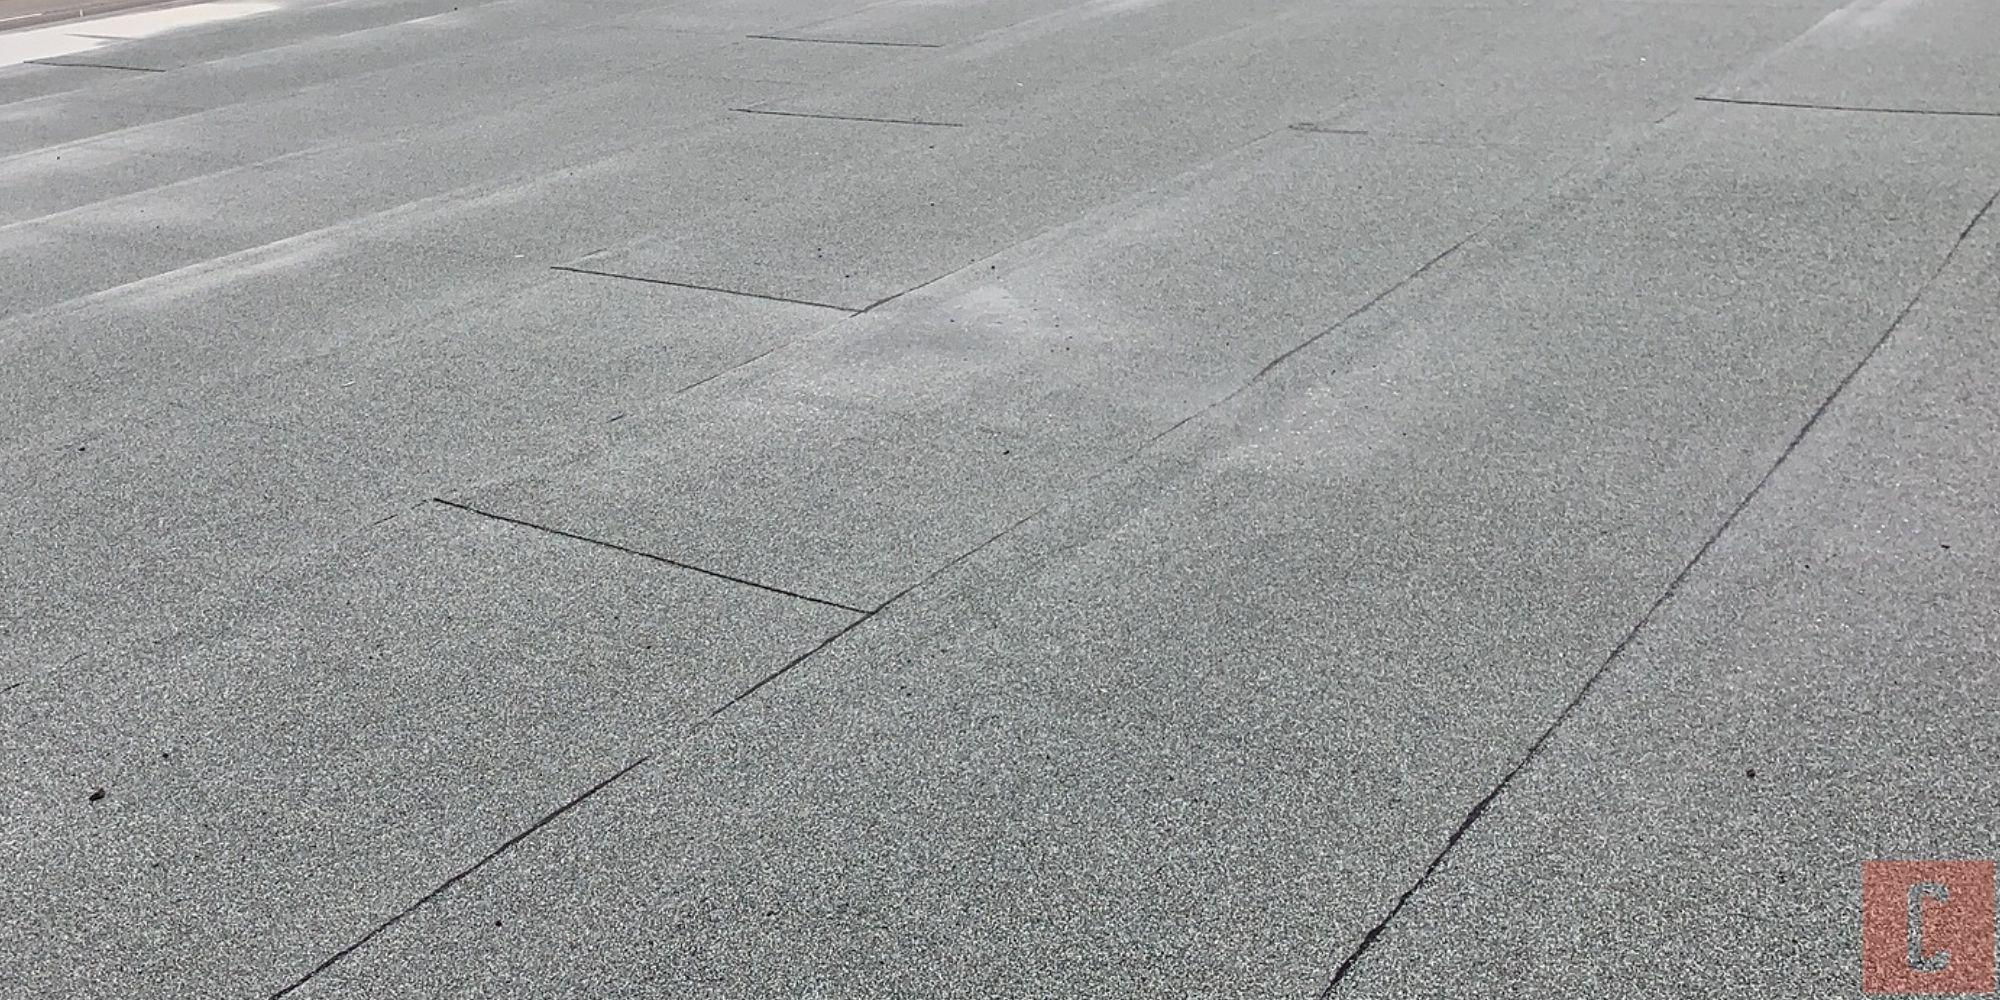 Membrane de toit plat en bon état